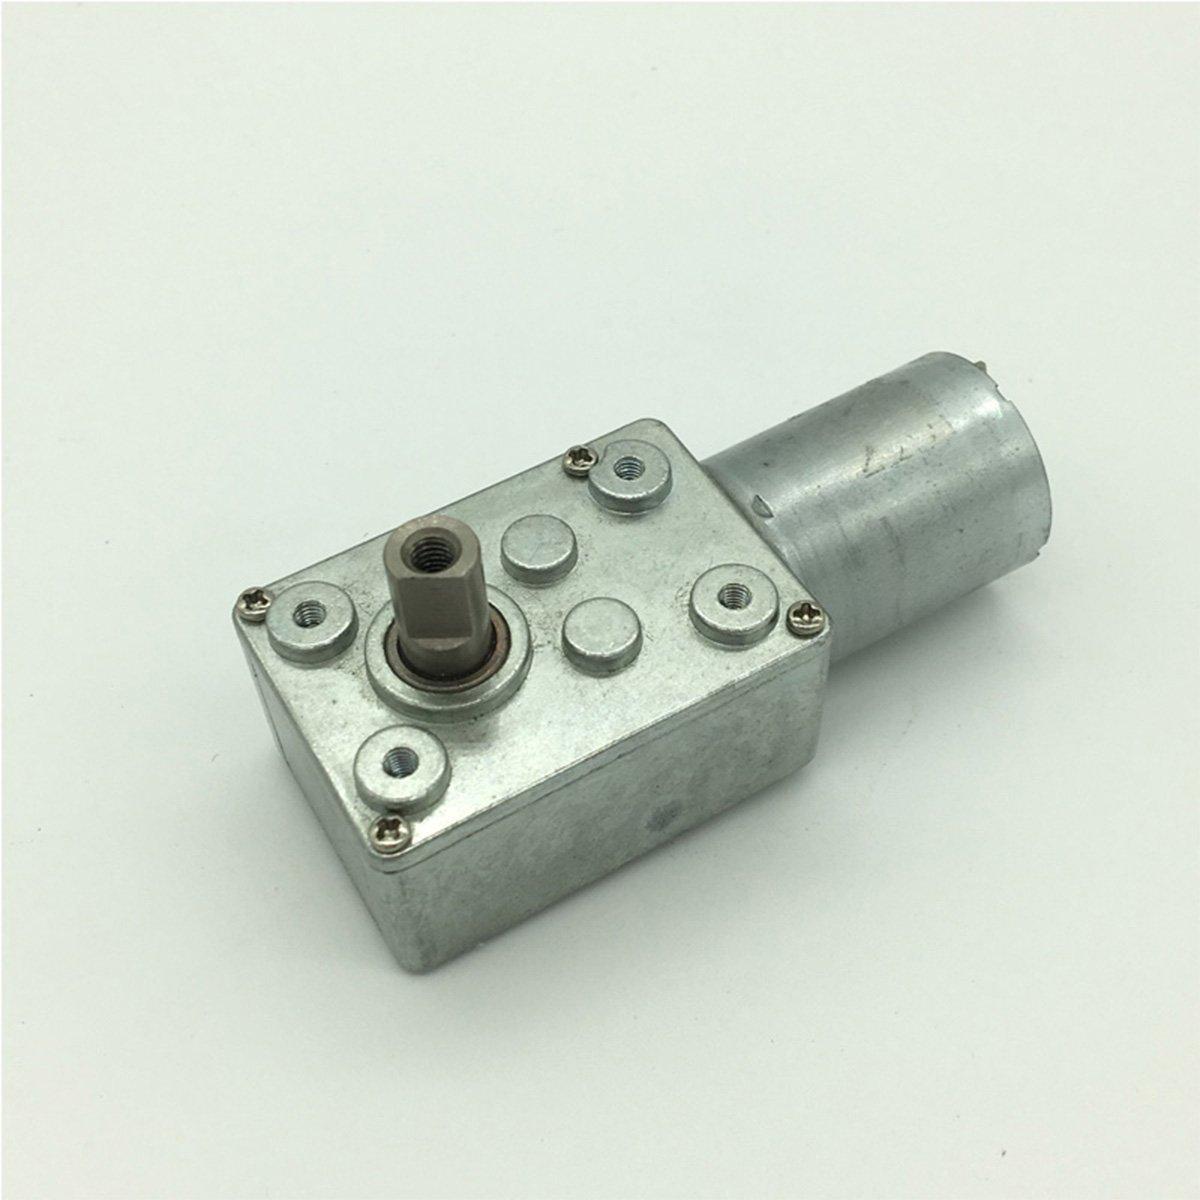 Bringsmart 12V DC Gear Motor 2RPM and Reducer Motor Low Speed Ratio 1: 3000 Self-lock